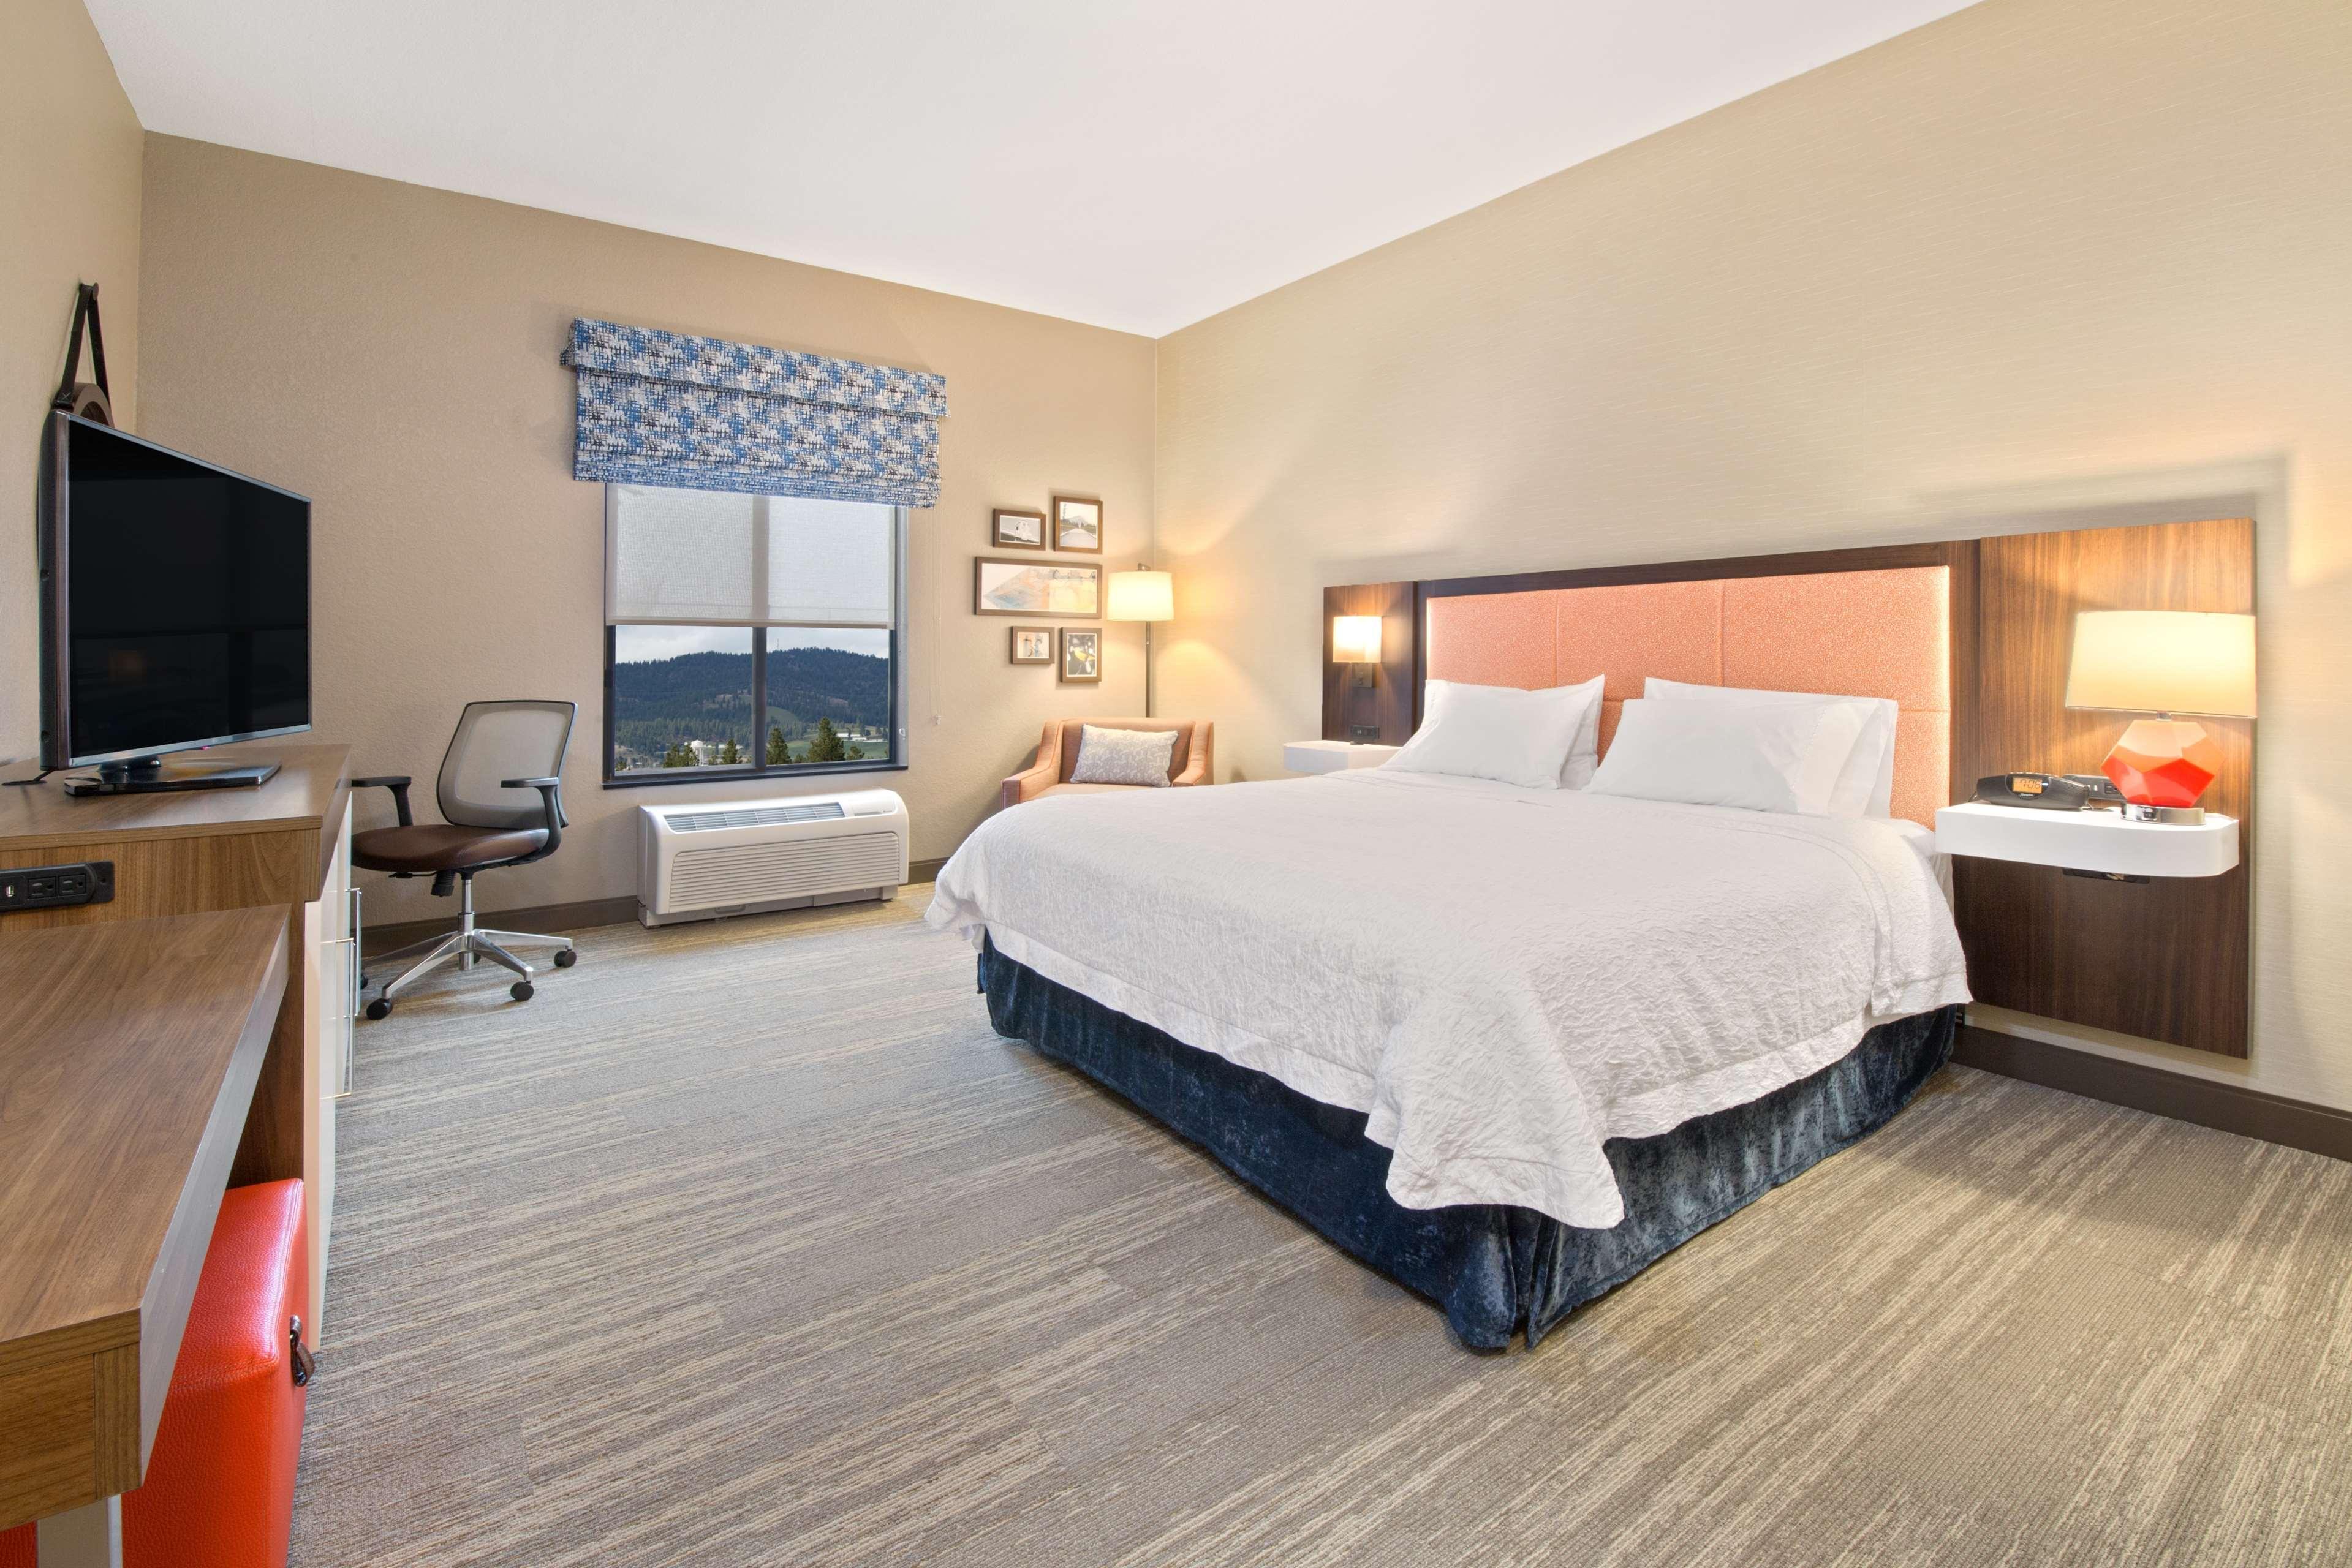 Hampton Inn & Suites Spokane Valley image 18